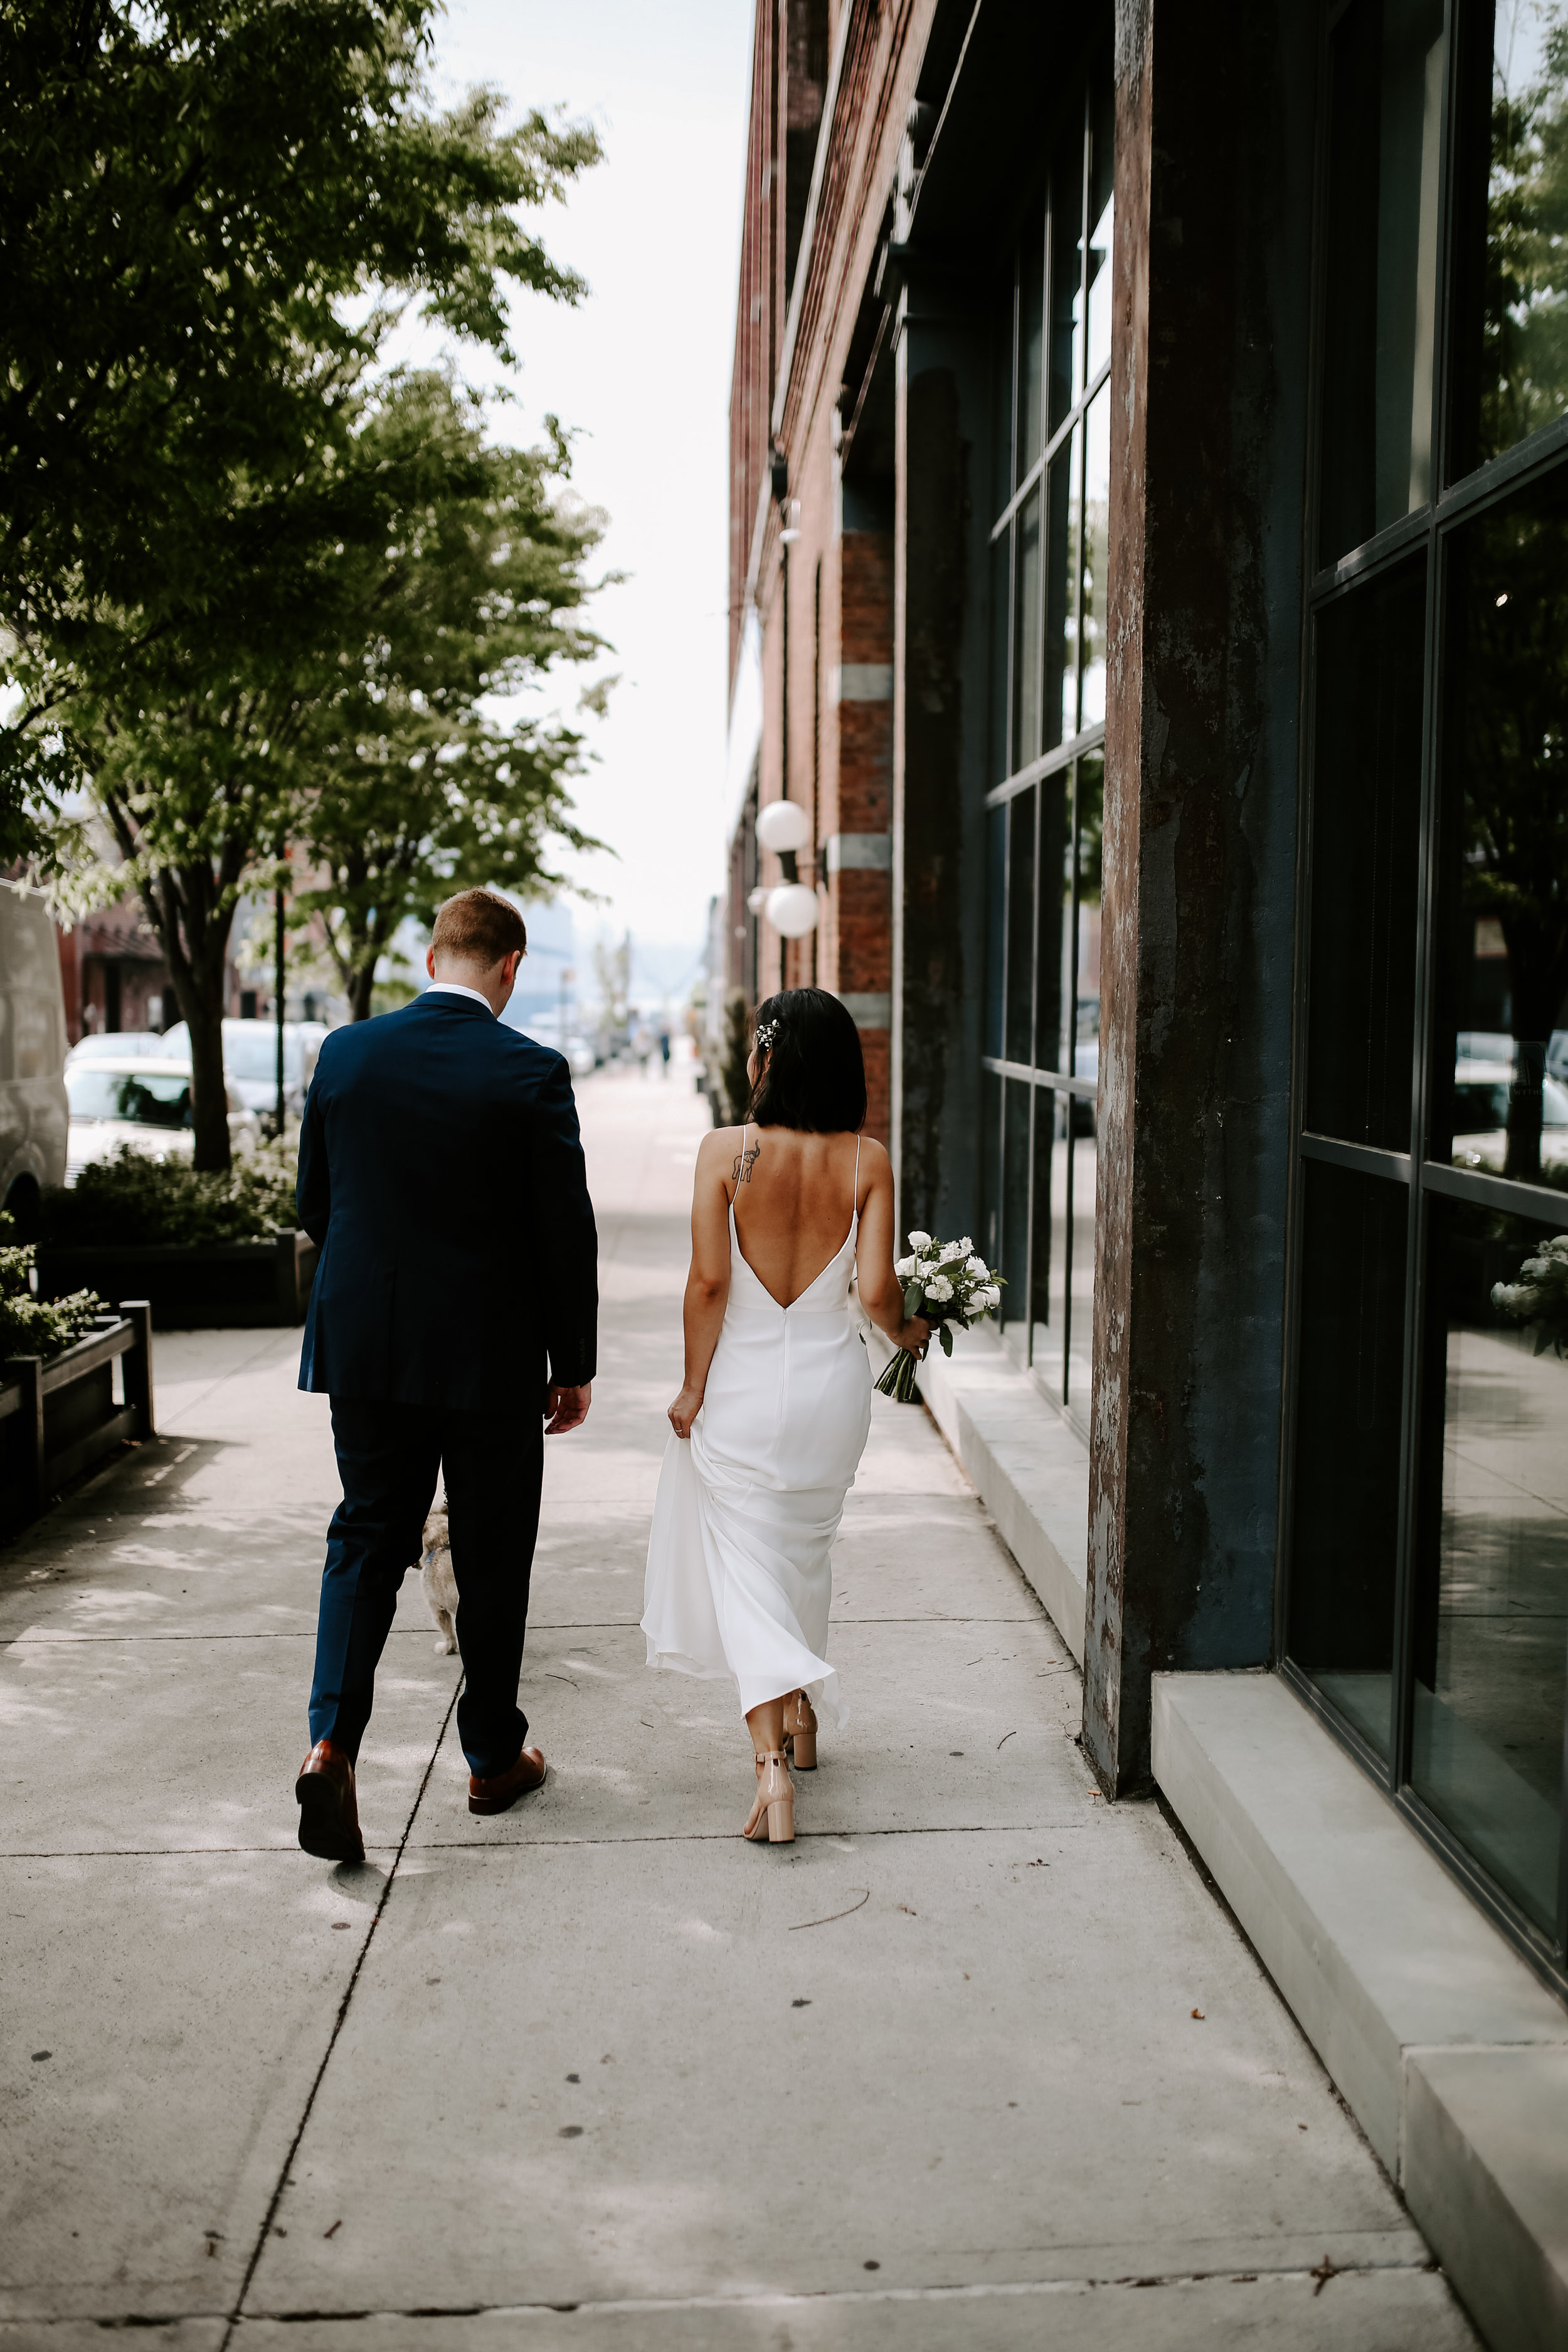 TheNichols_Married_2019-1-70.jpg